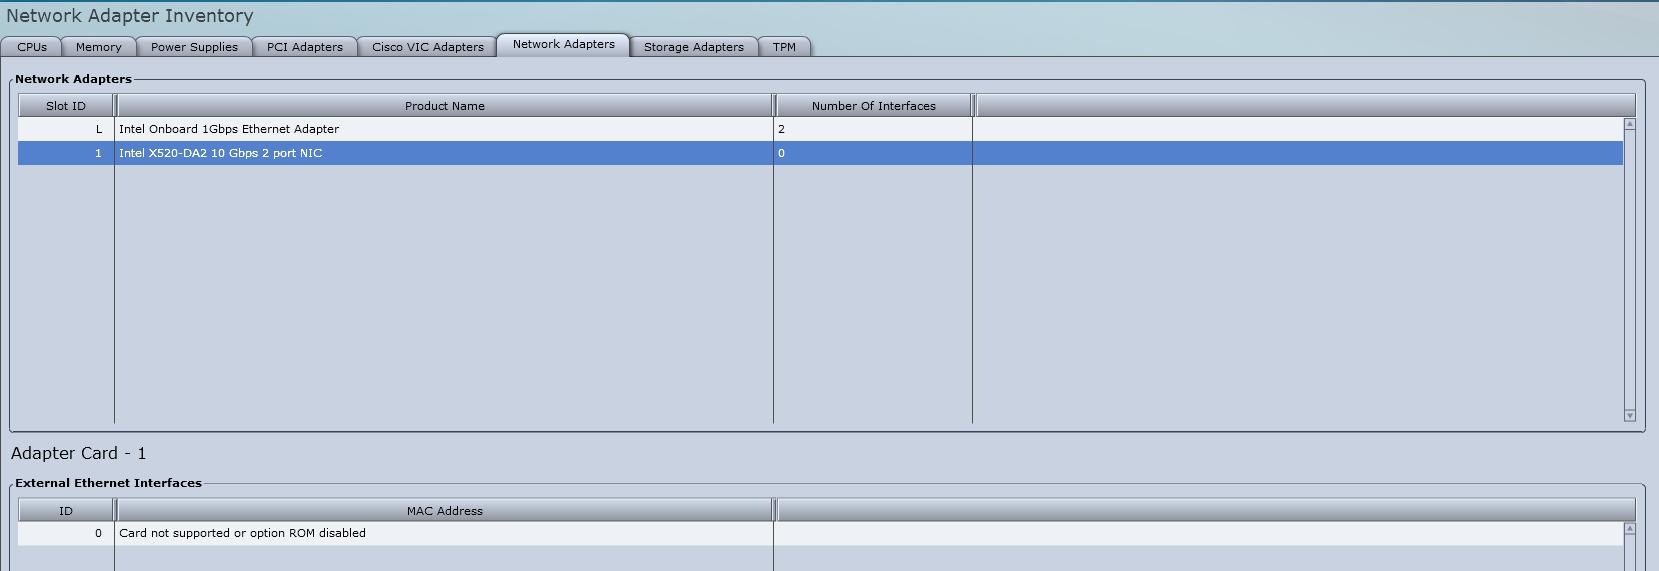 Intel® PRO/1000 PT Dual Port Server adapt (PCI Express) with